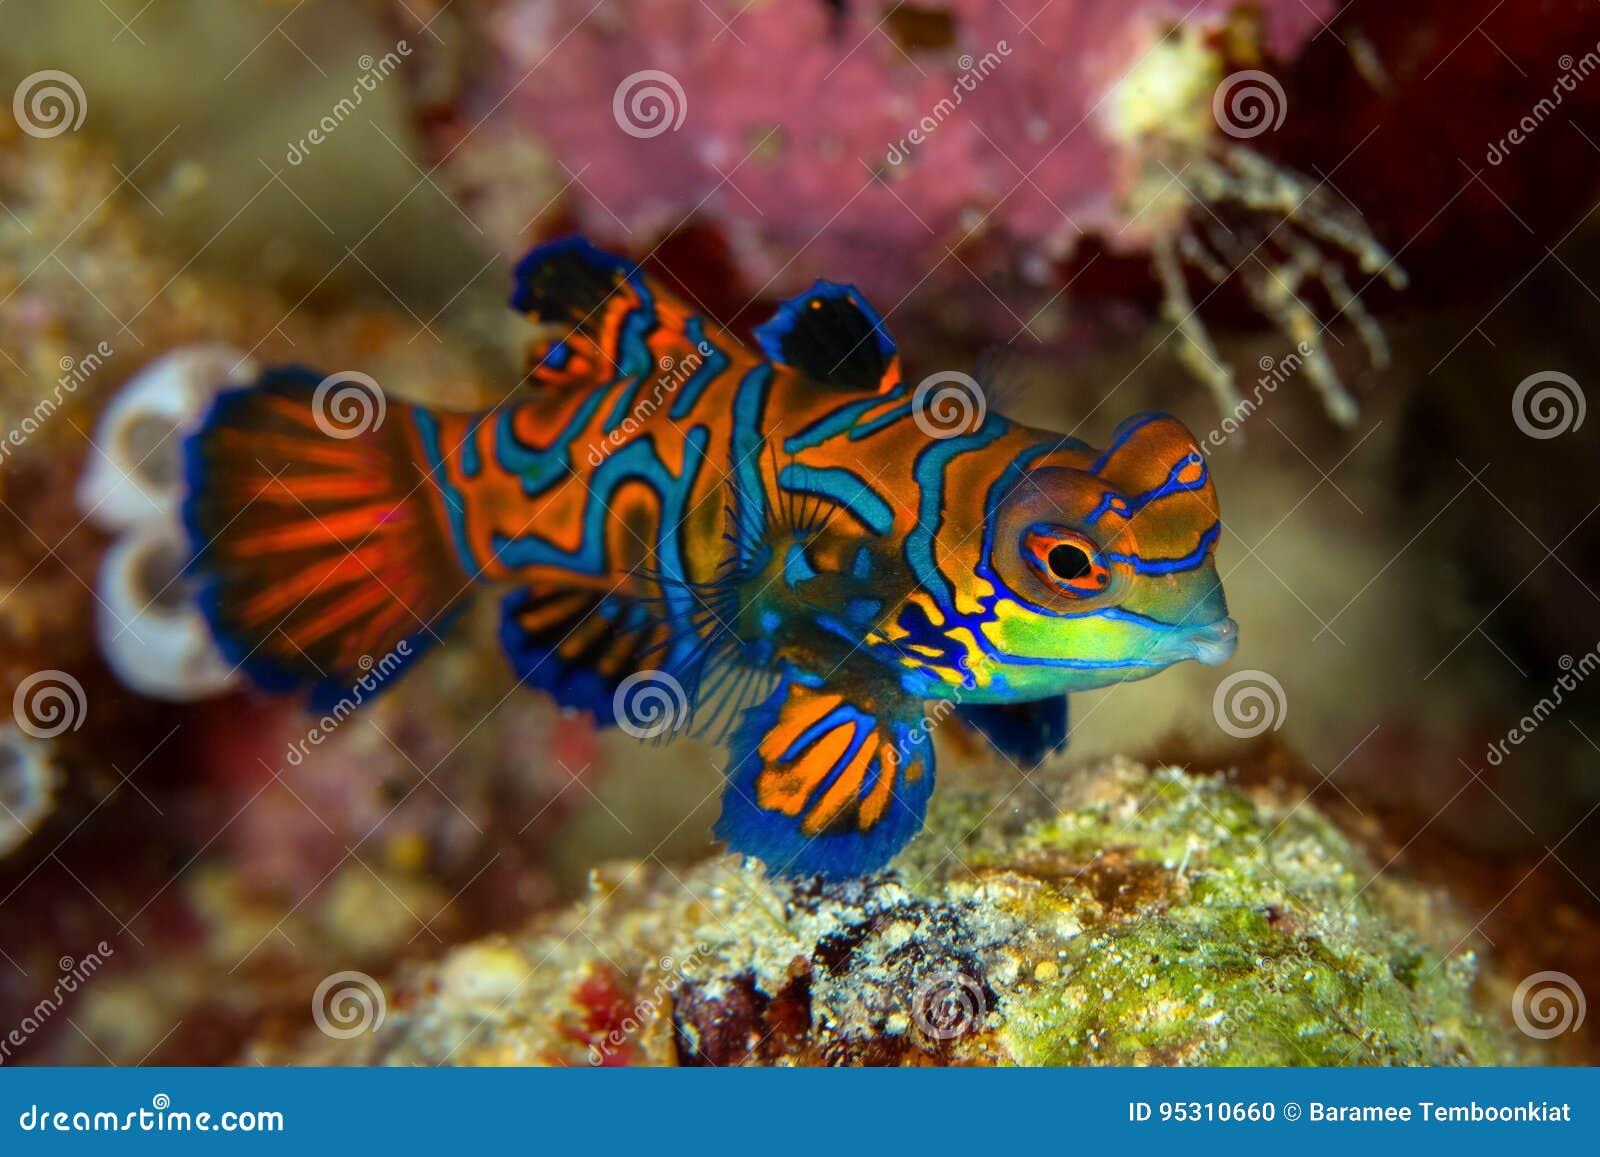 Mandarinfish或普通话dragonet Synchiropus splendidus是